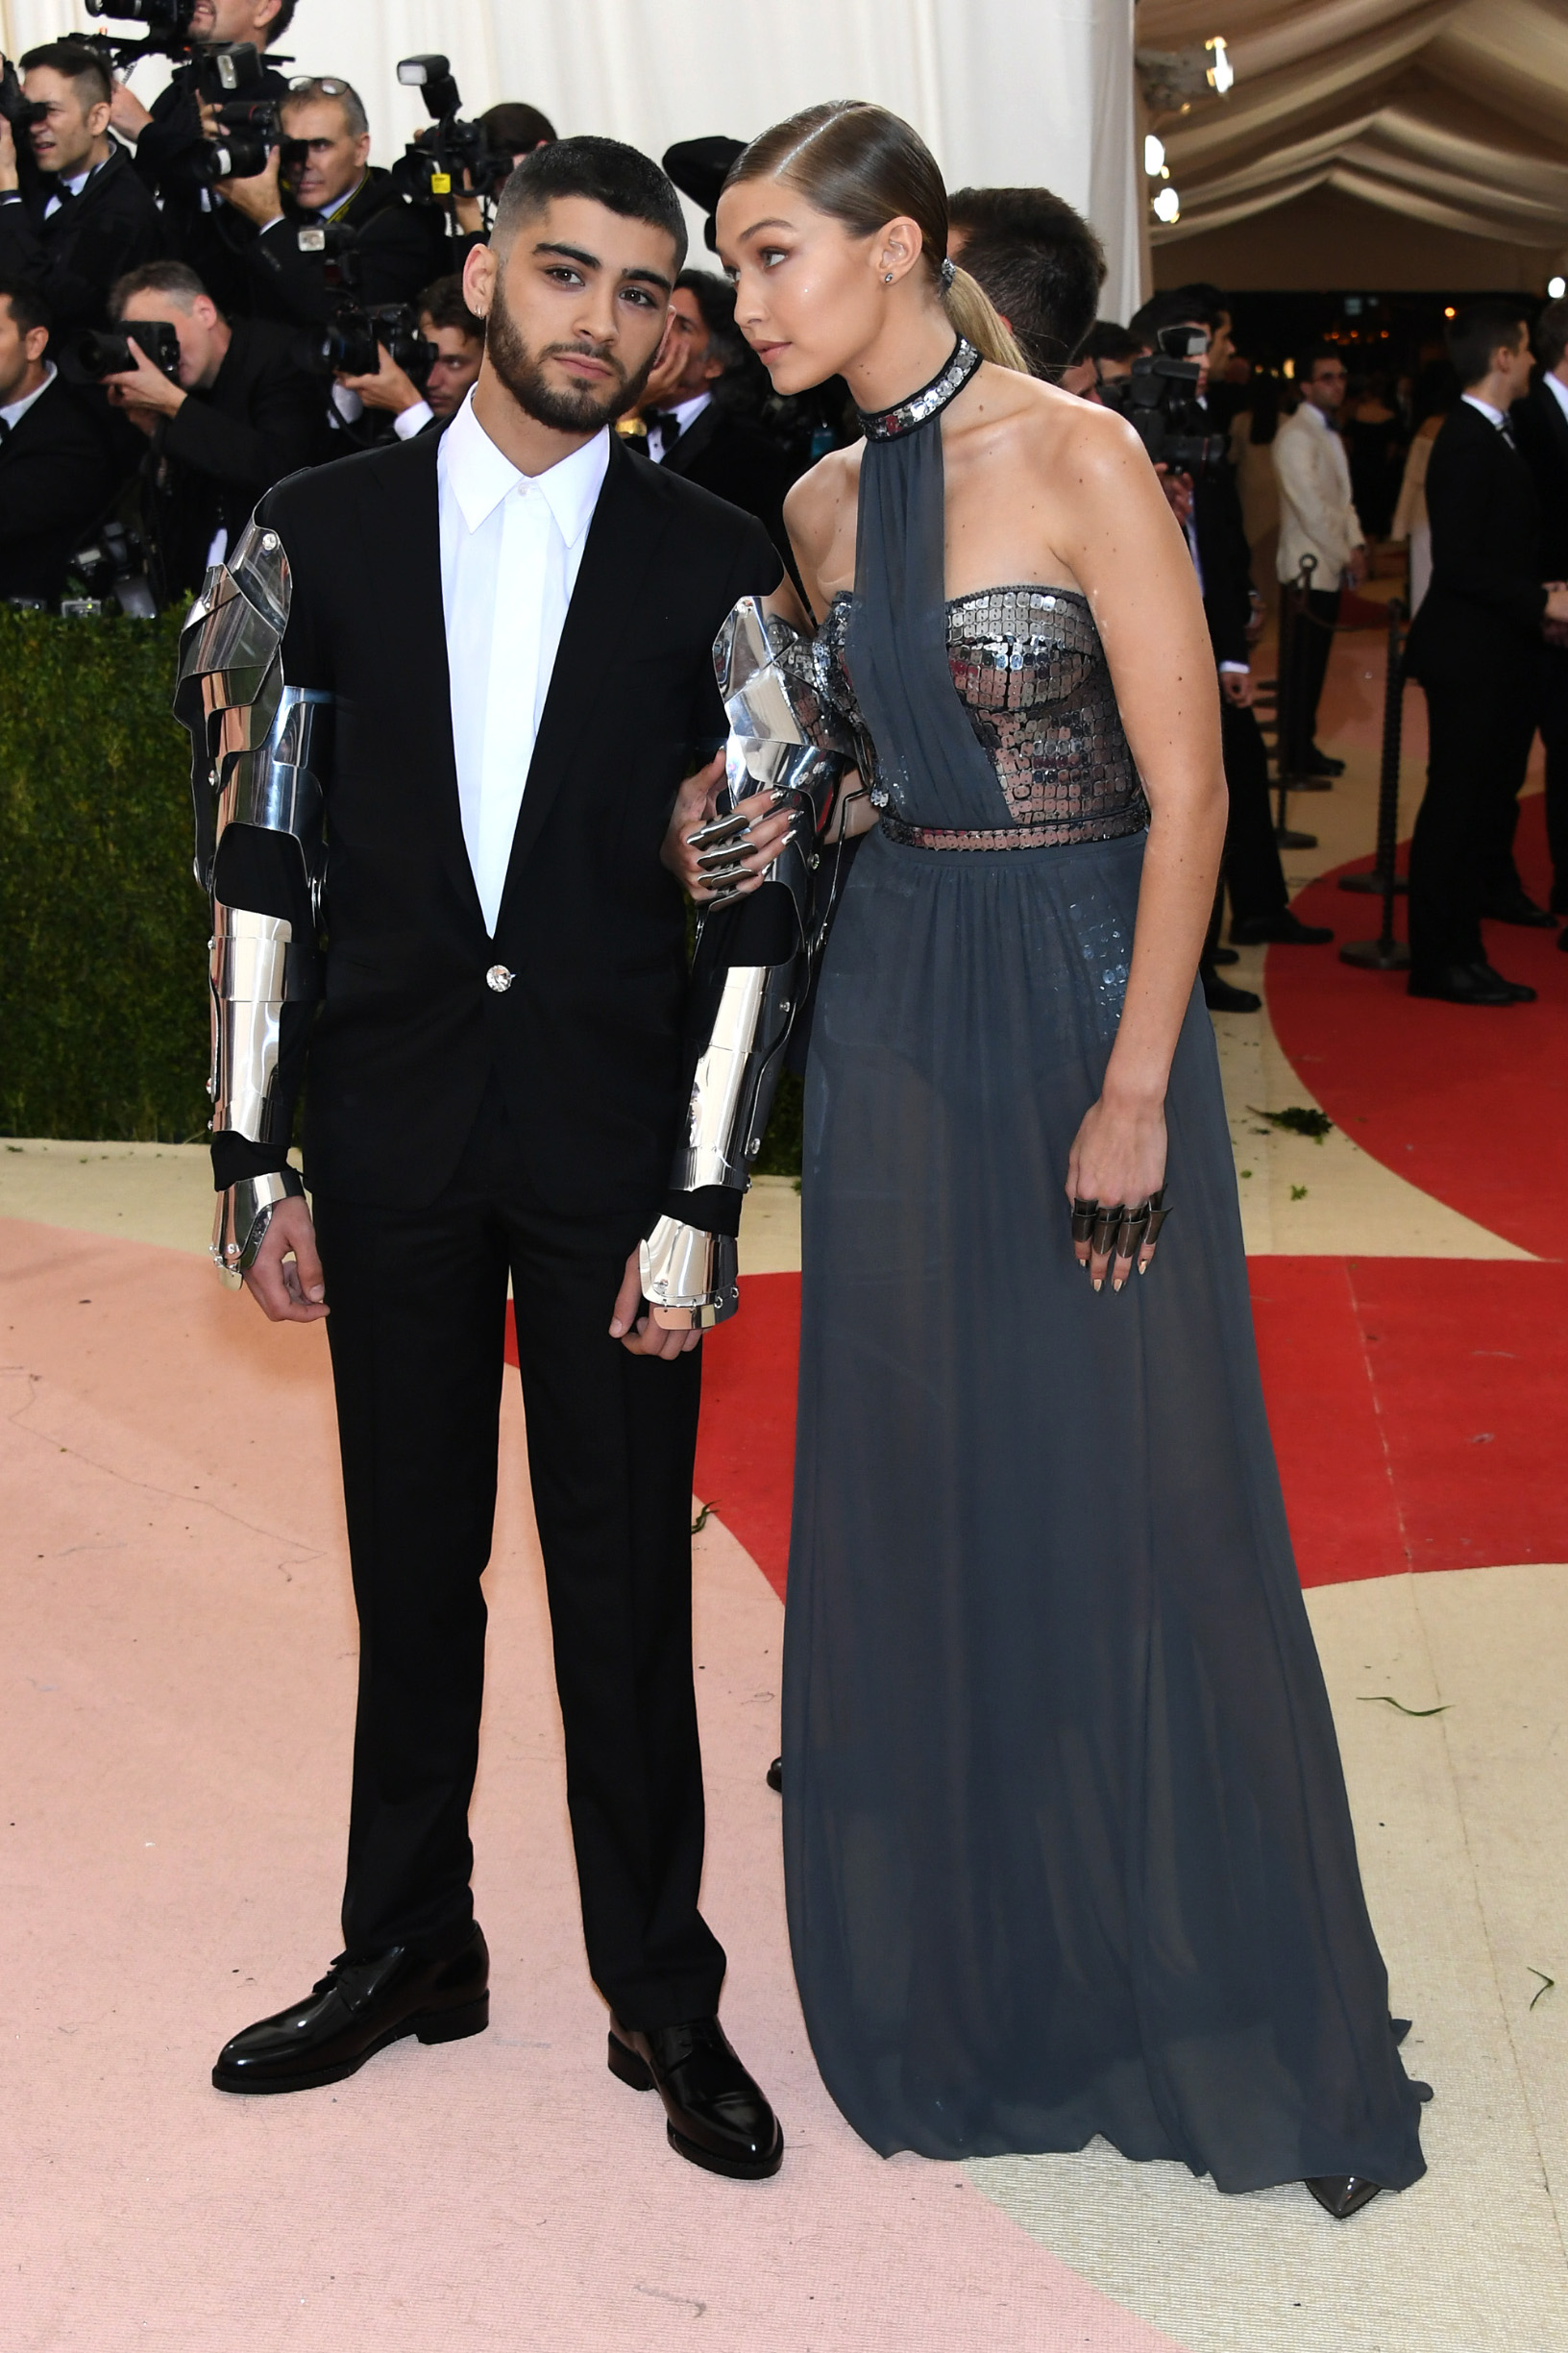 NEW YORK, NY - MAY 02:  Gigi Hadid (L) and Zayn Malik attend the